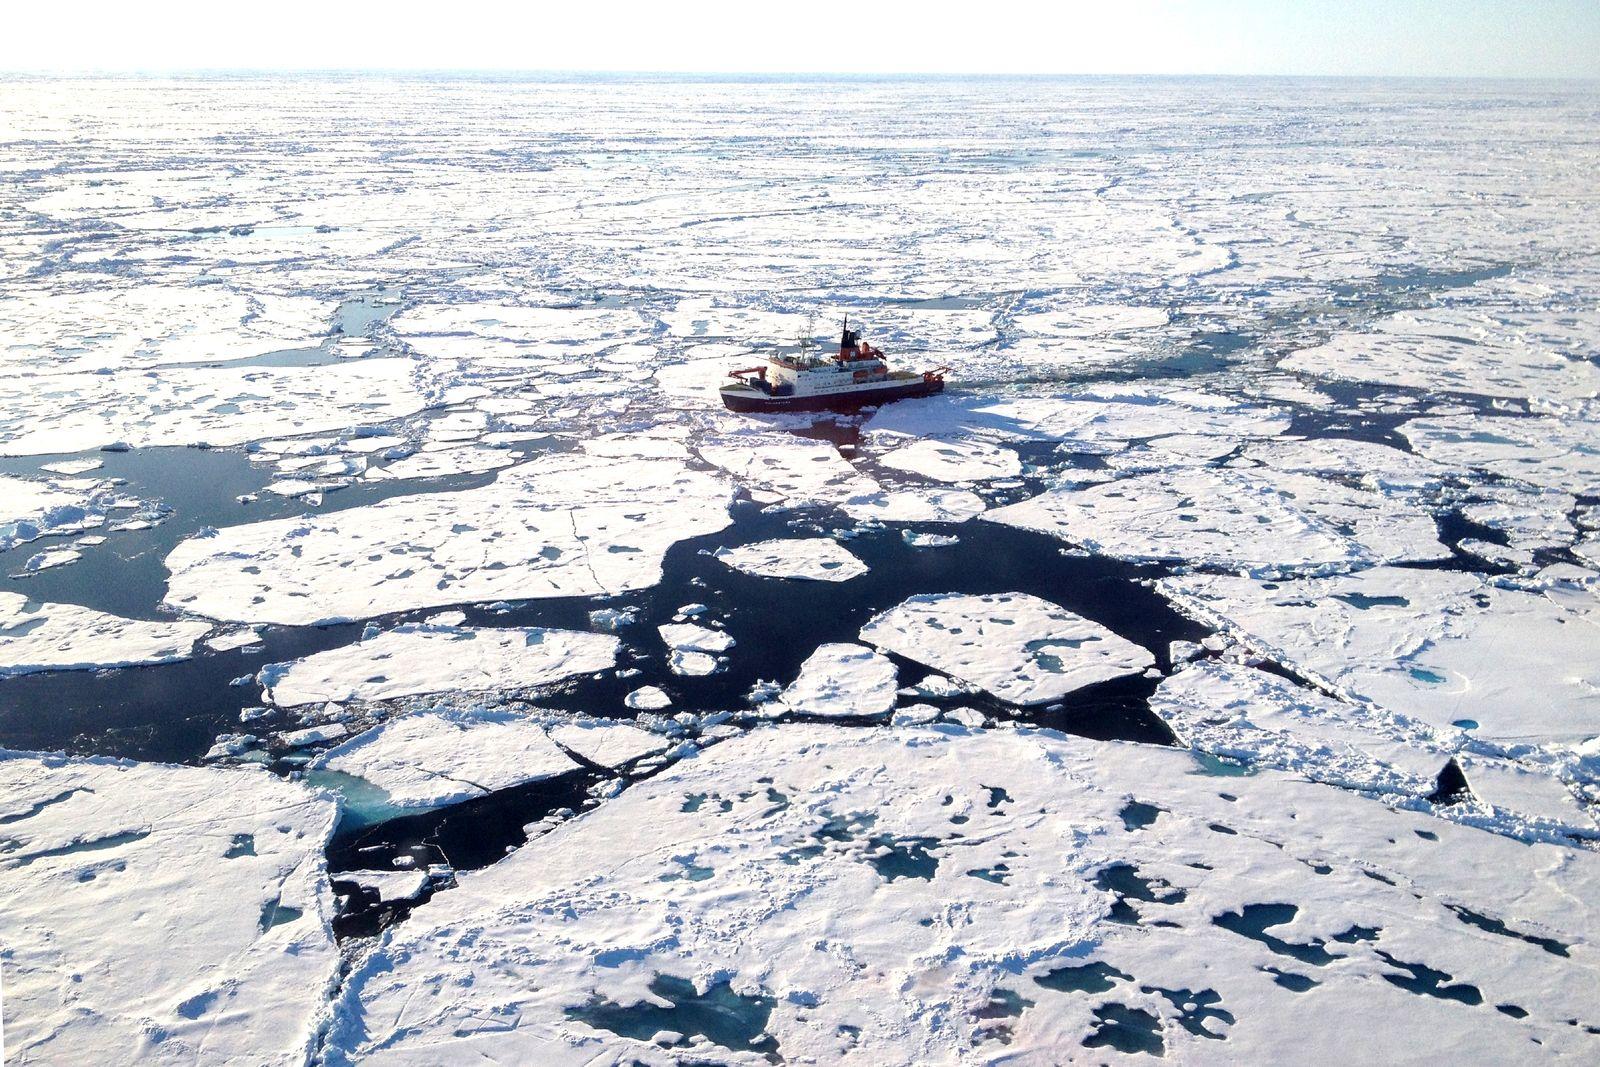 Polarstern / Arktis